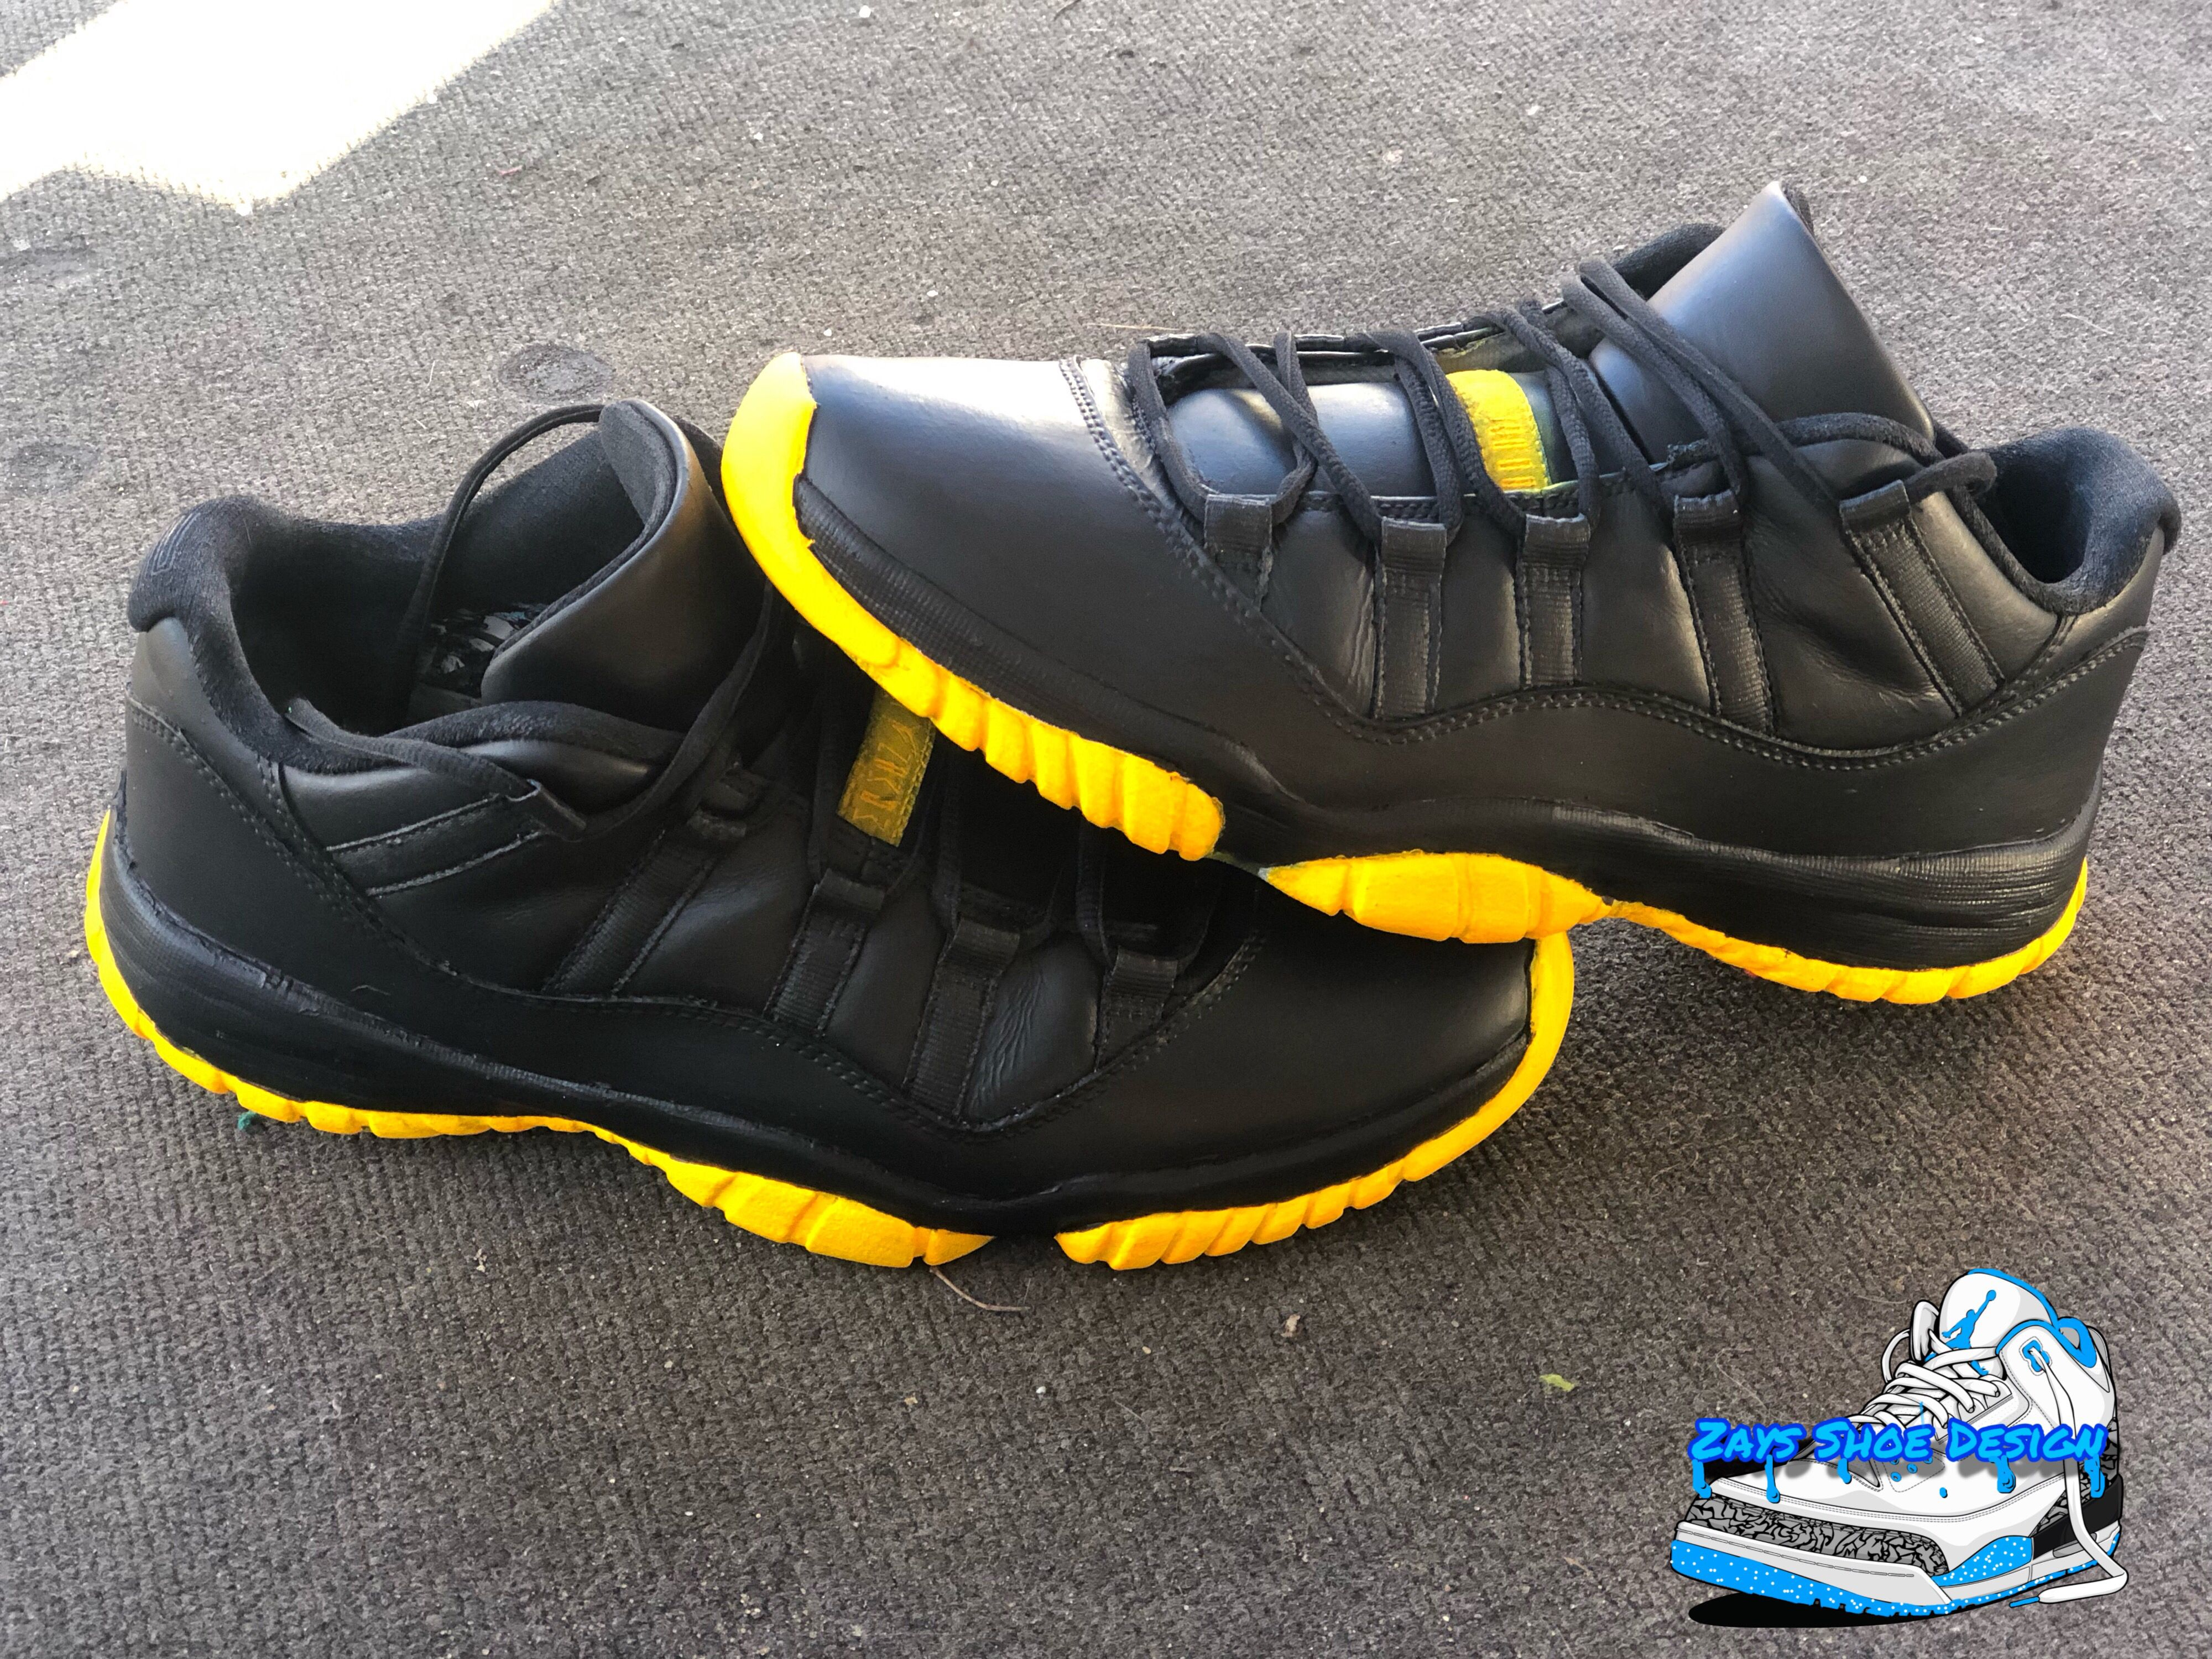 48fcd82dd2e #zaysshoedesign #customshoes #jordans #jordan11 #nike #sunset #black #yellow